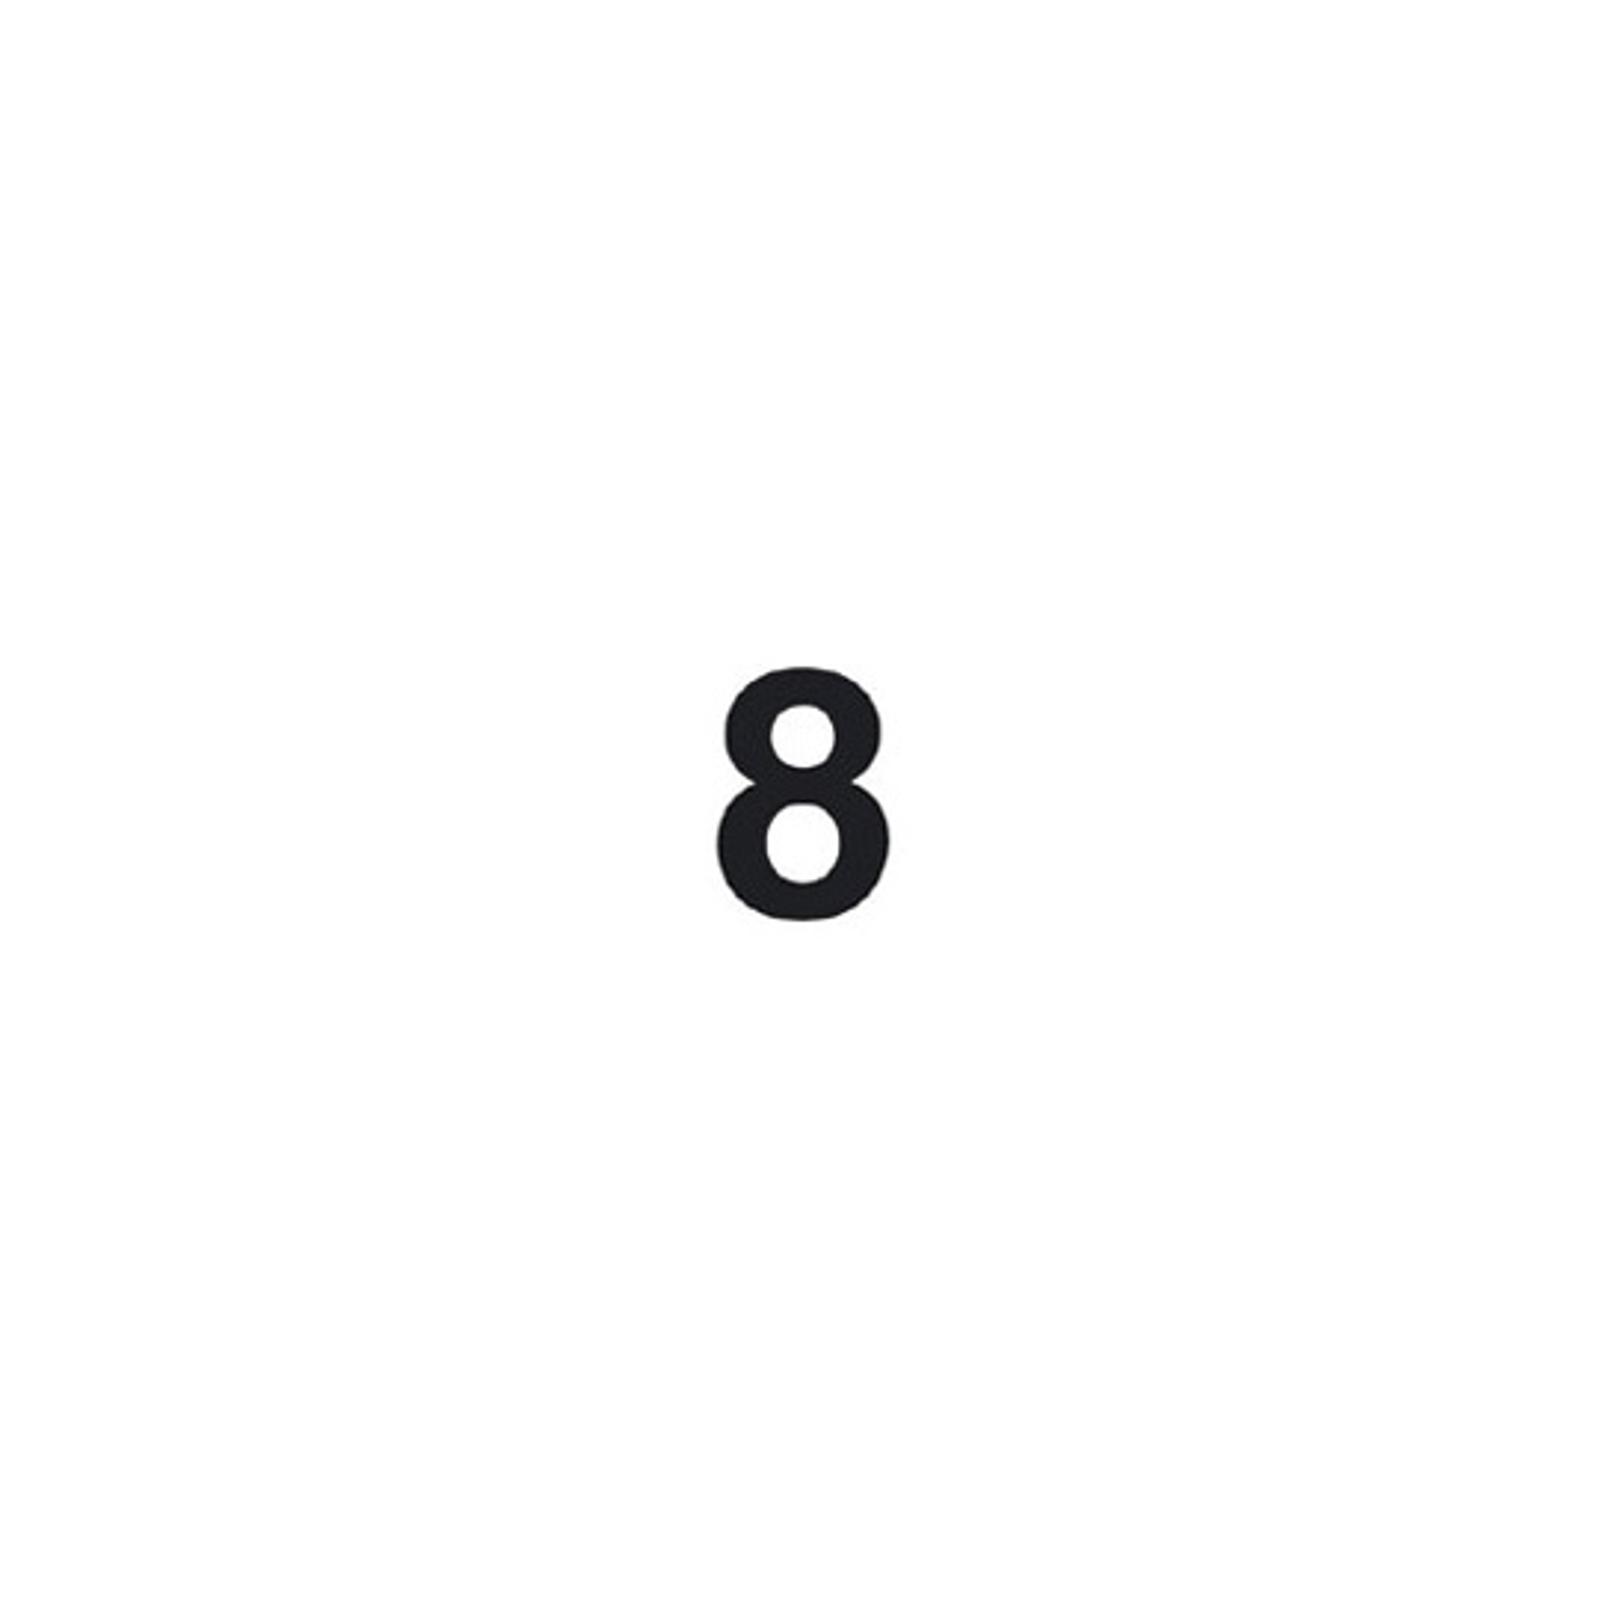 Cifra autoadesiva 8